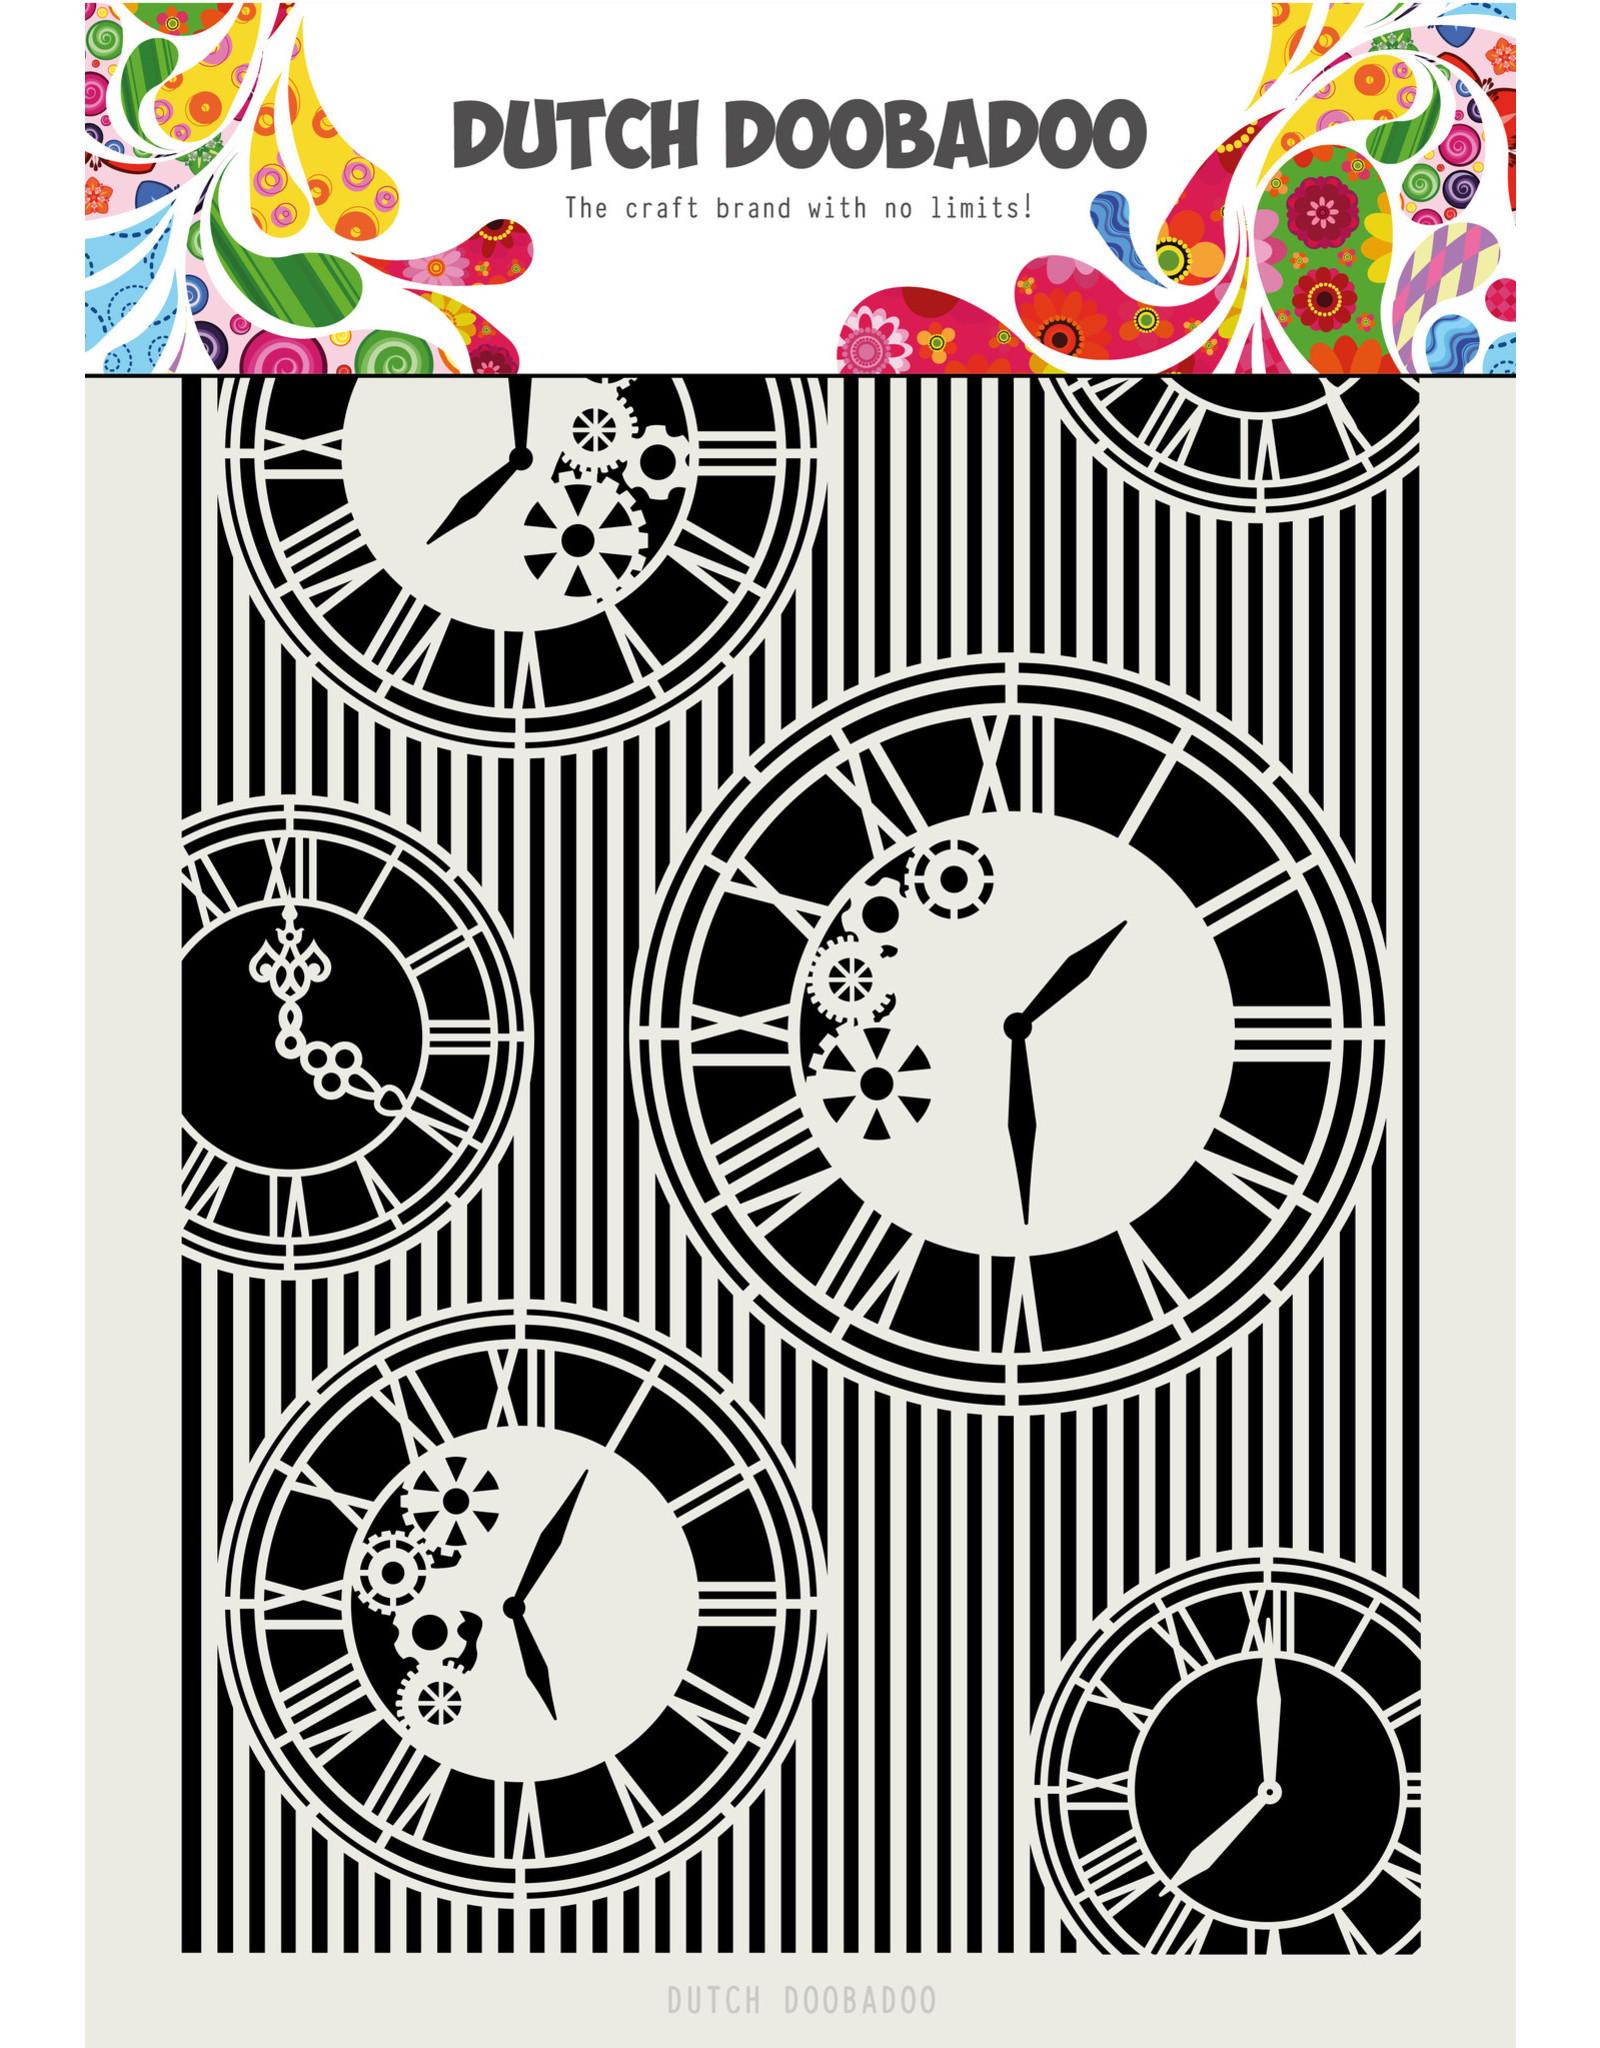 Dutch Doobadoo DDBD Mask Art A4 Clocks Stripes